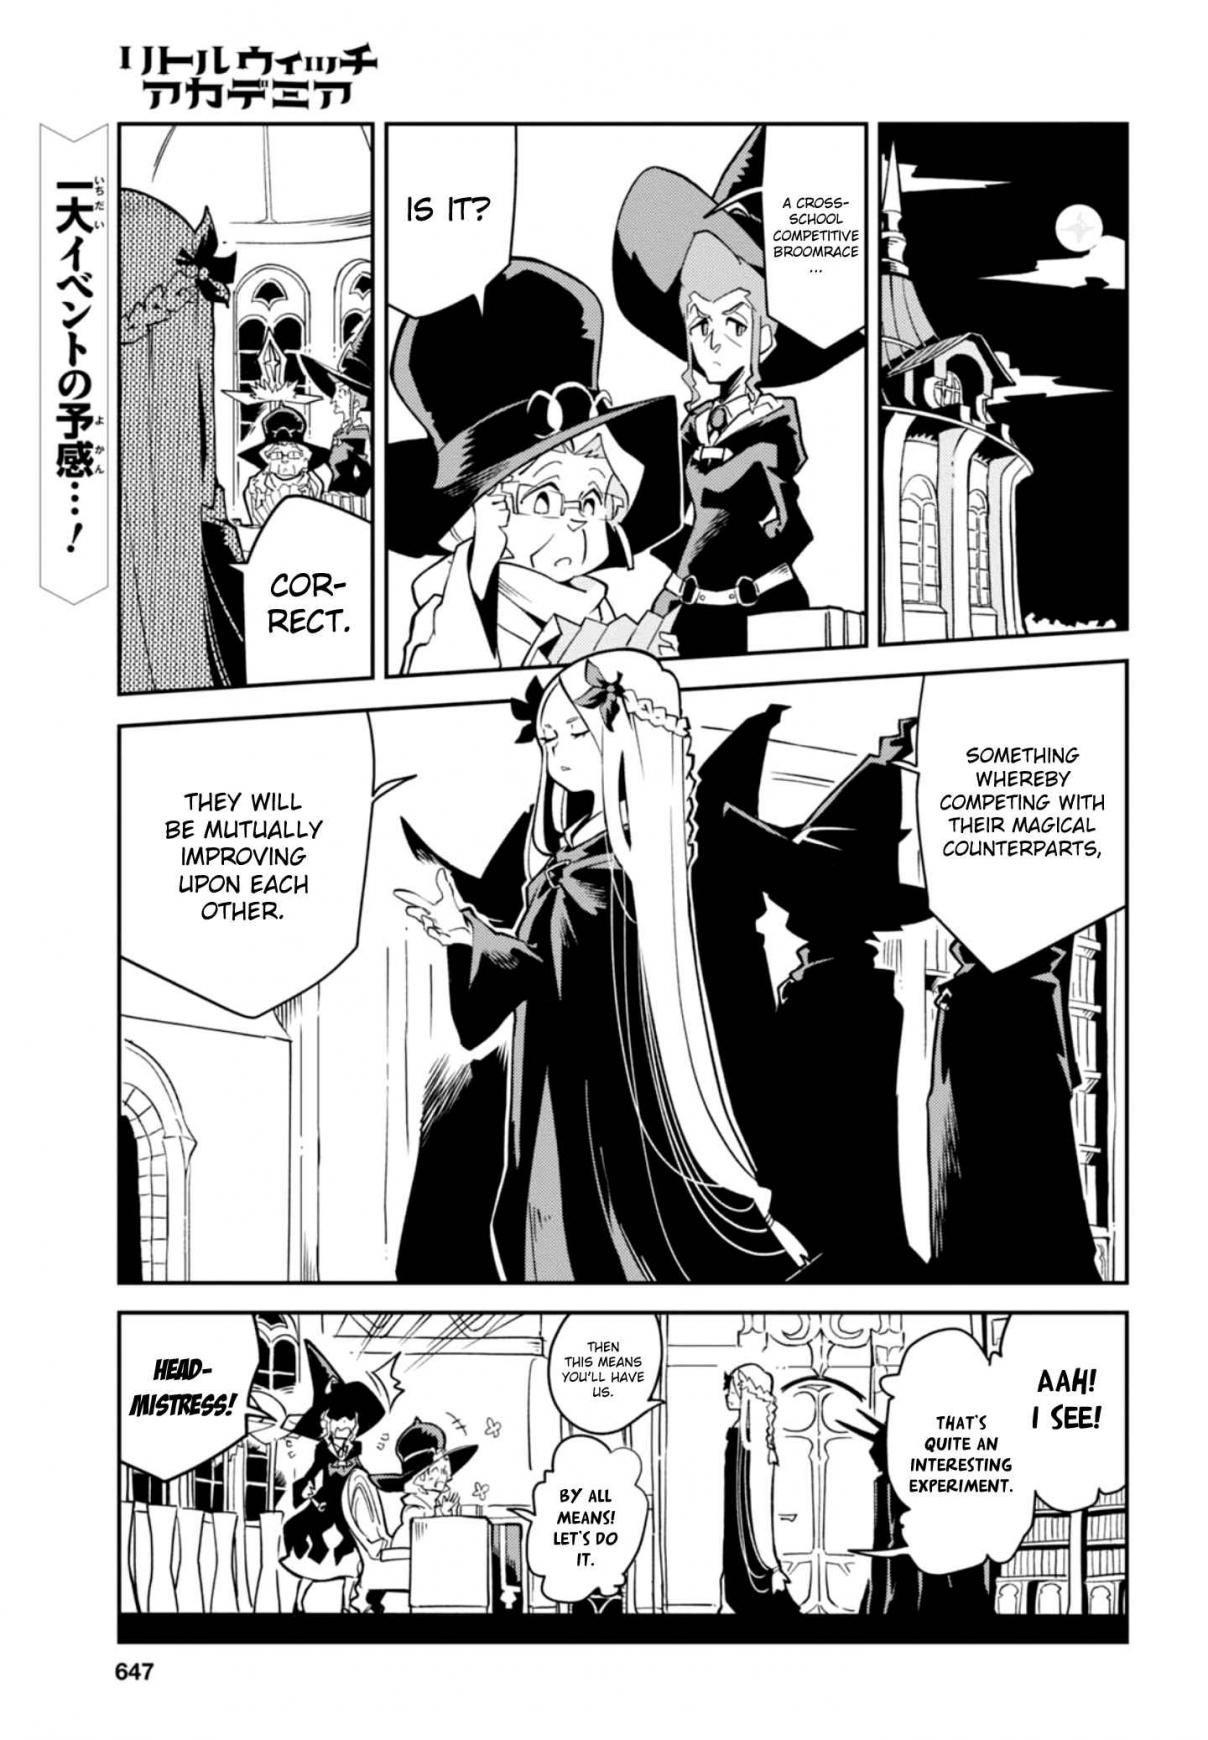 Pin By Erika On Mangas Uwu Witch Academia Manga Pages Slayer Anime